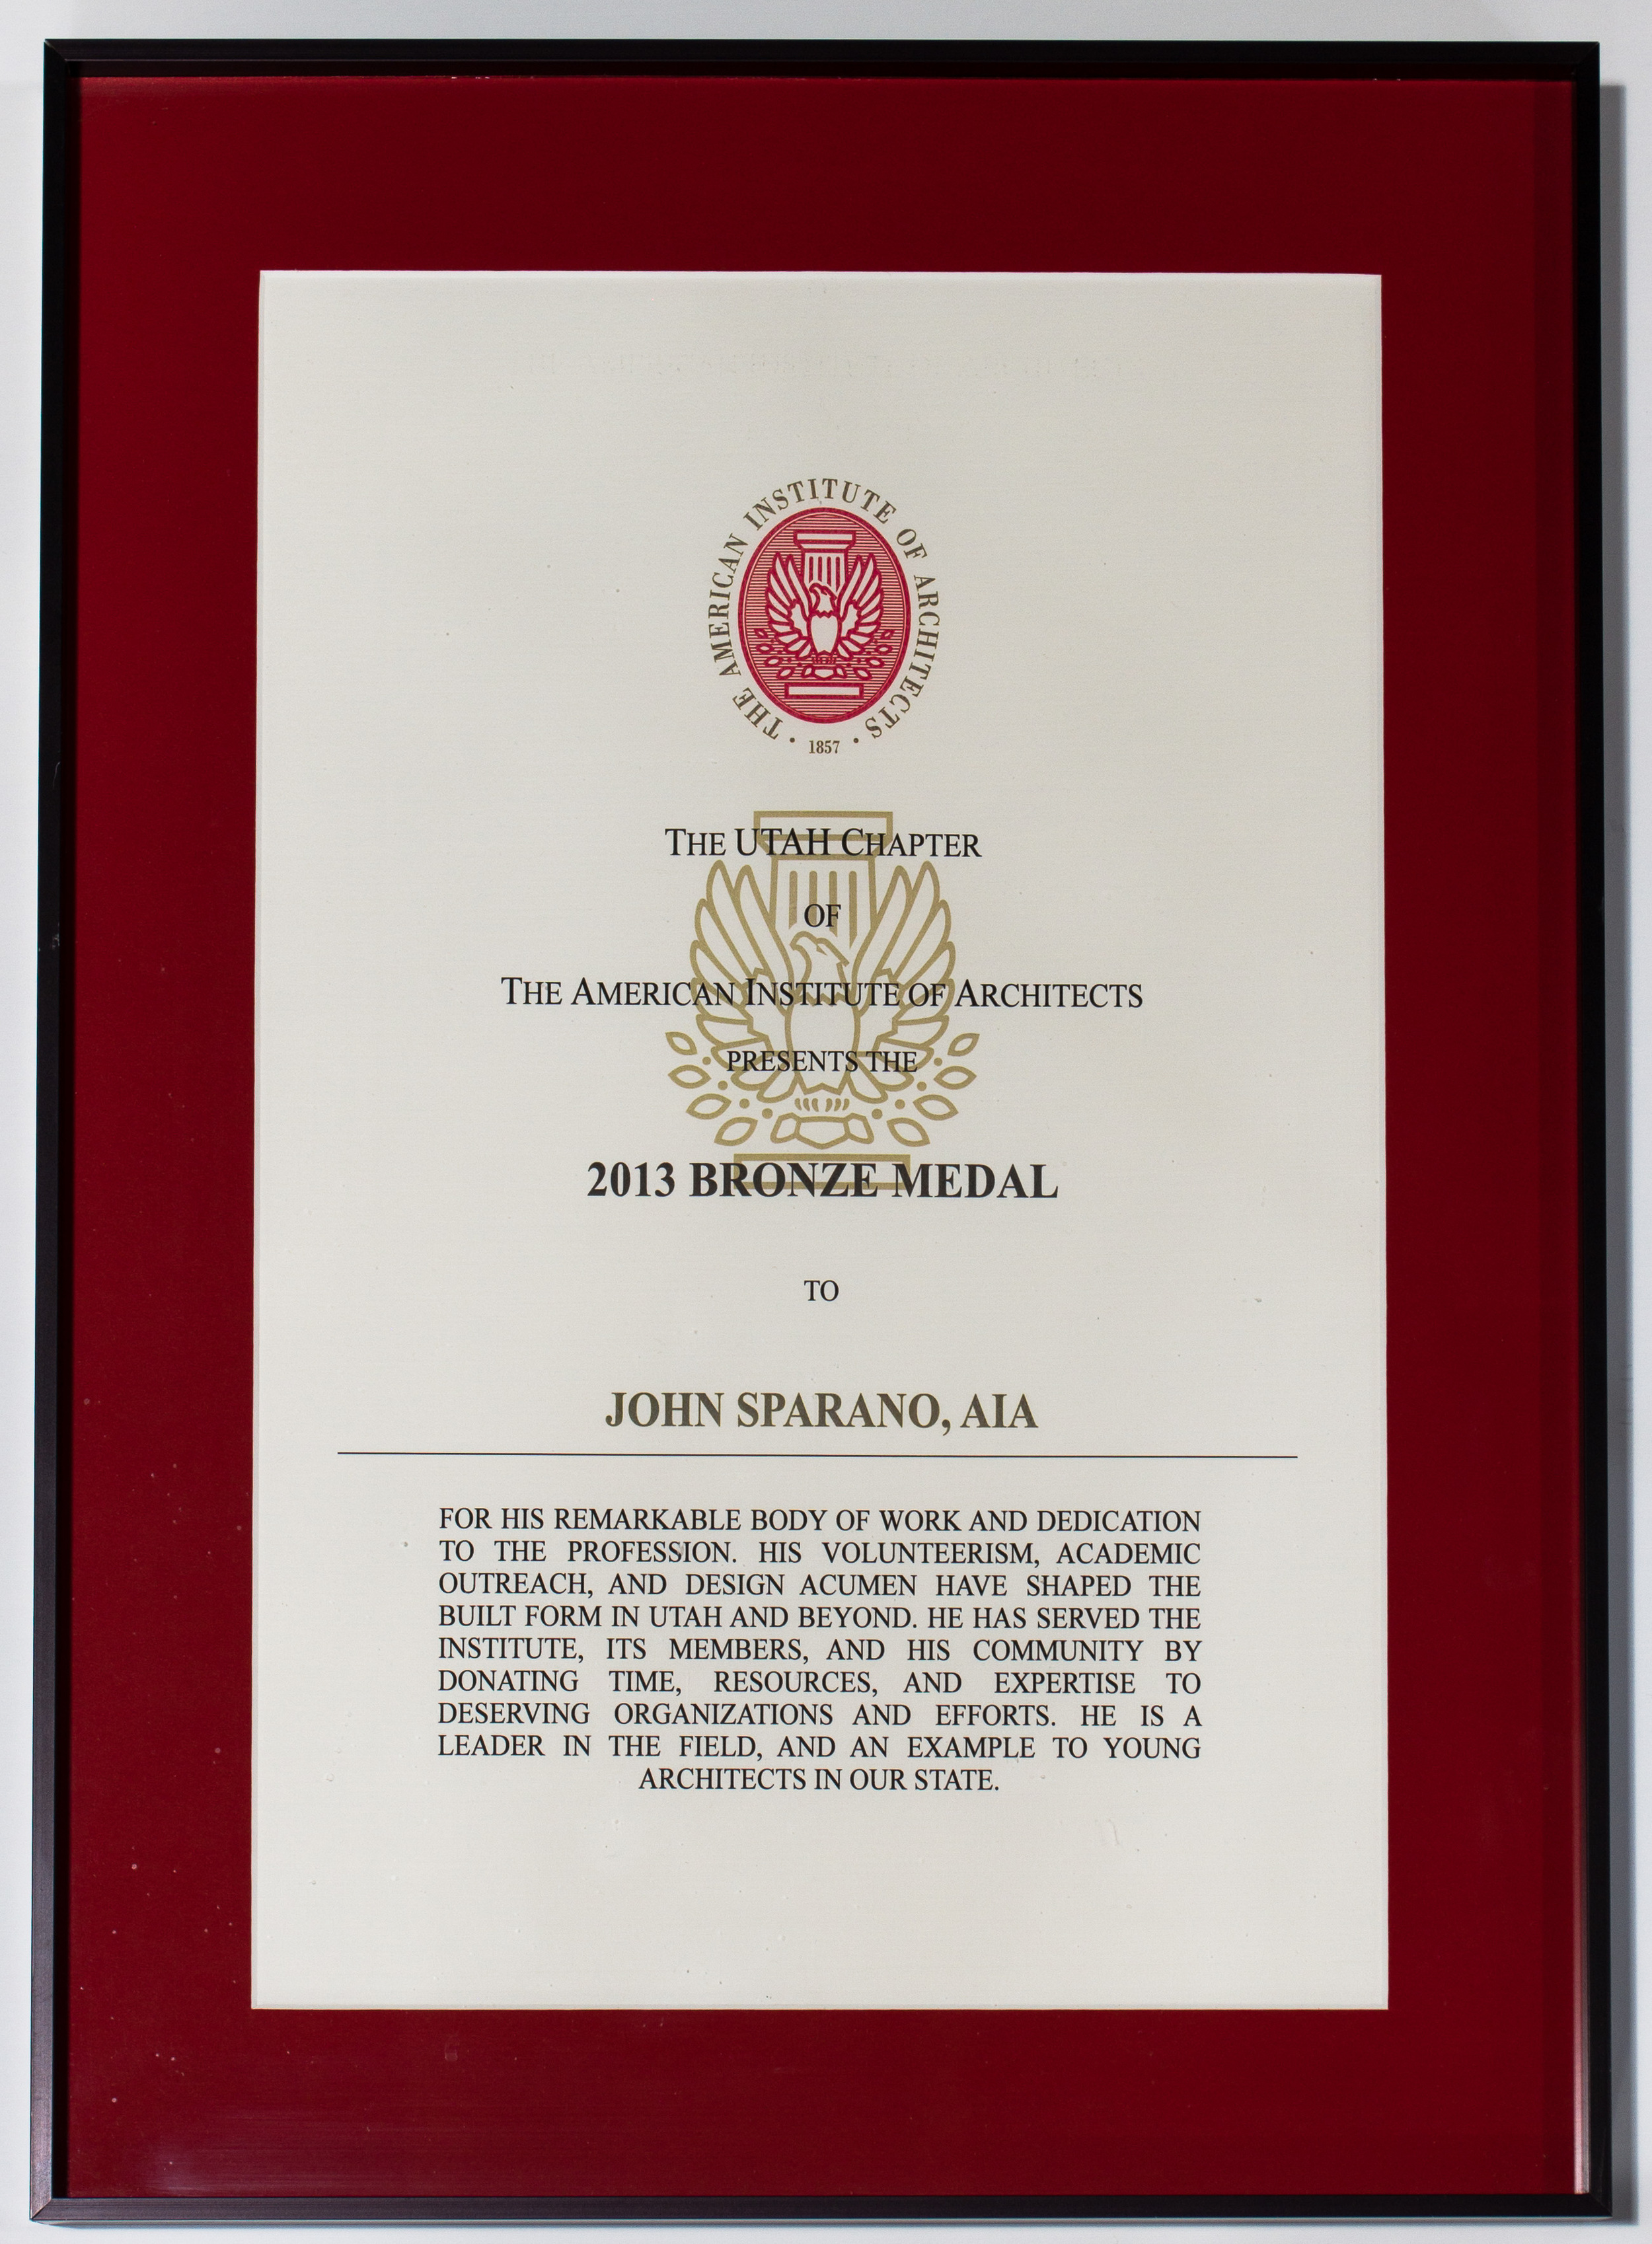 SparanoMooneyArchitecture_Award(11)